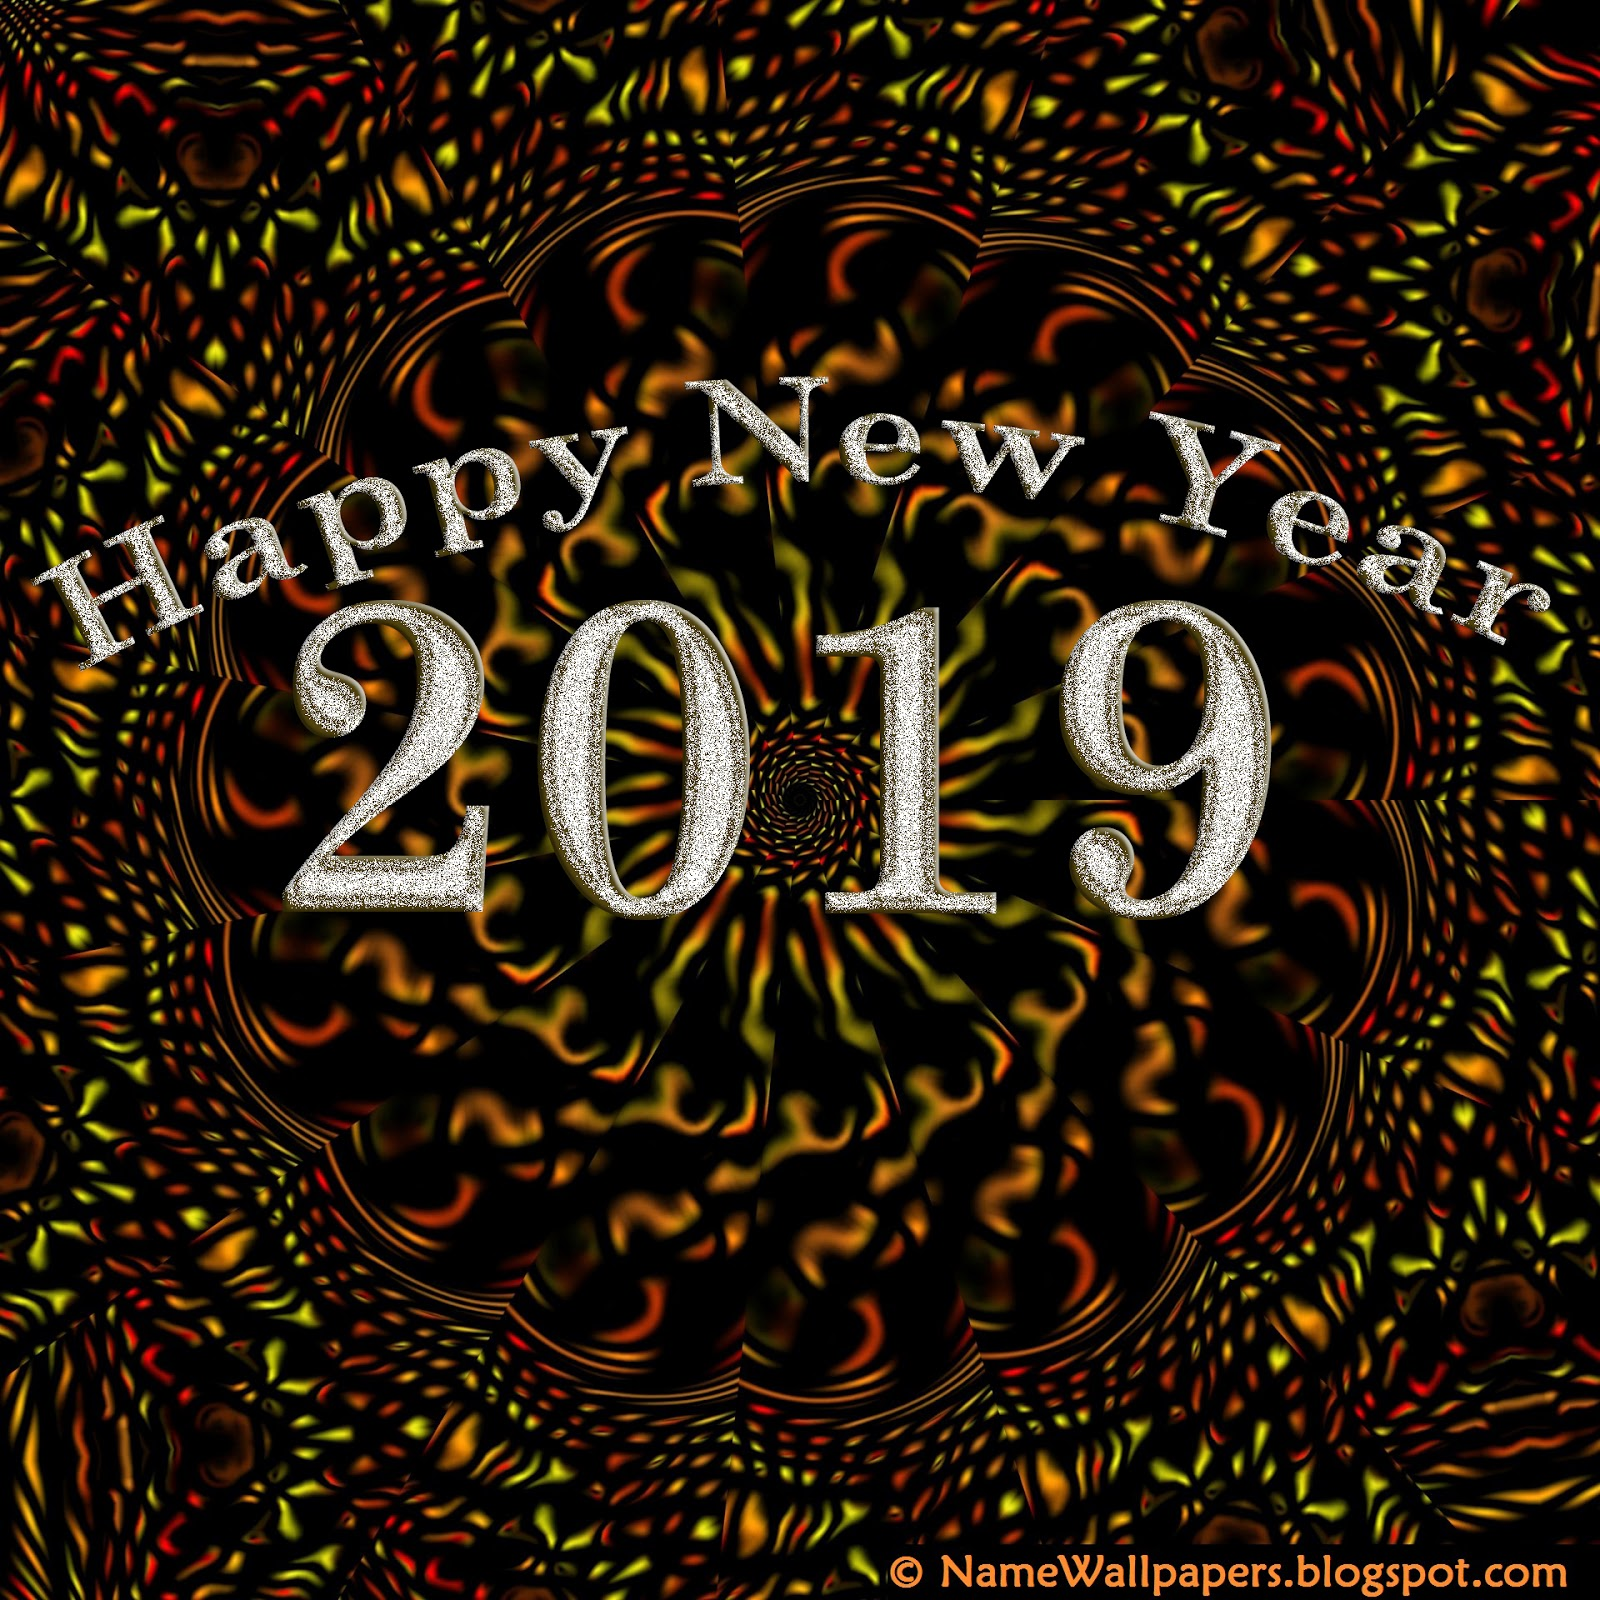 Happy New Year 2019 Images HD Happy New Year 2019 Images 1600x1600